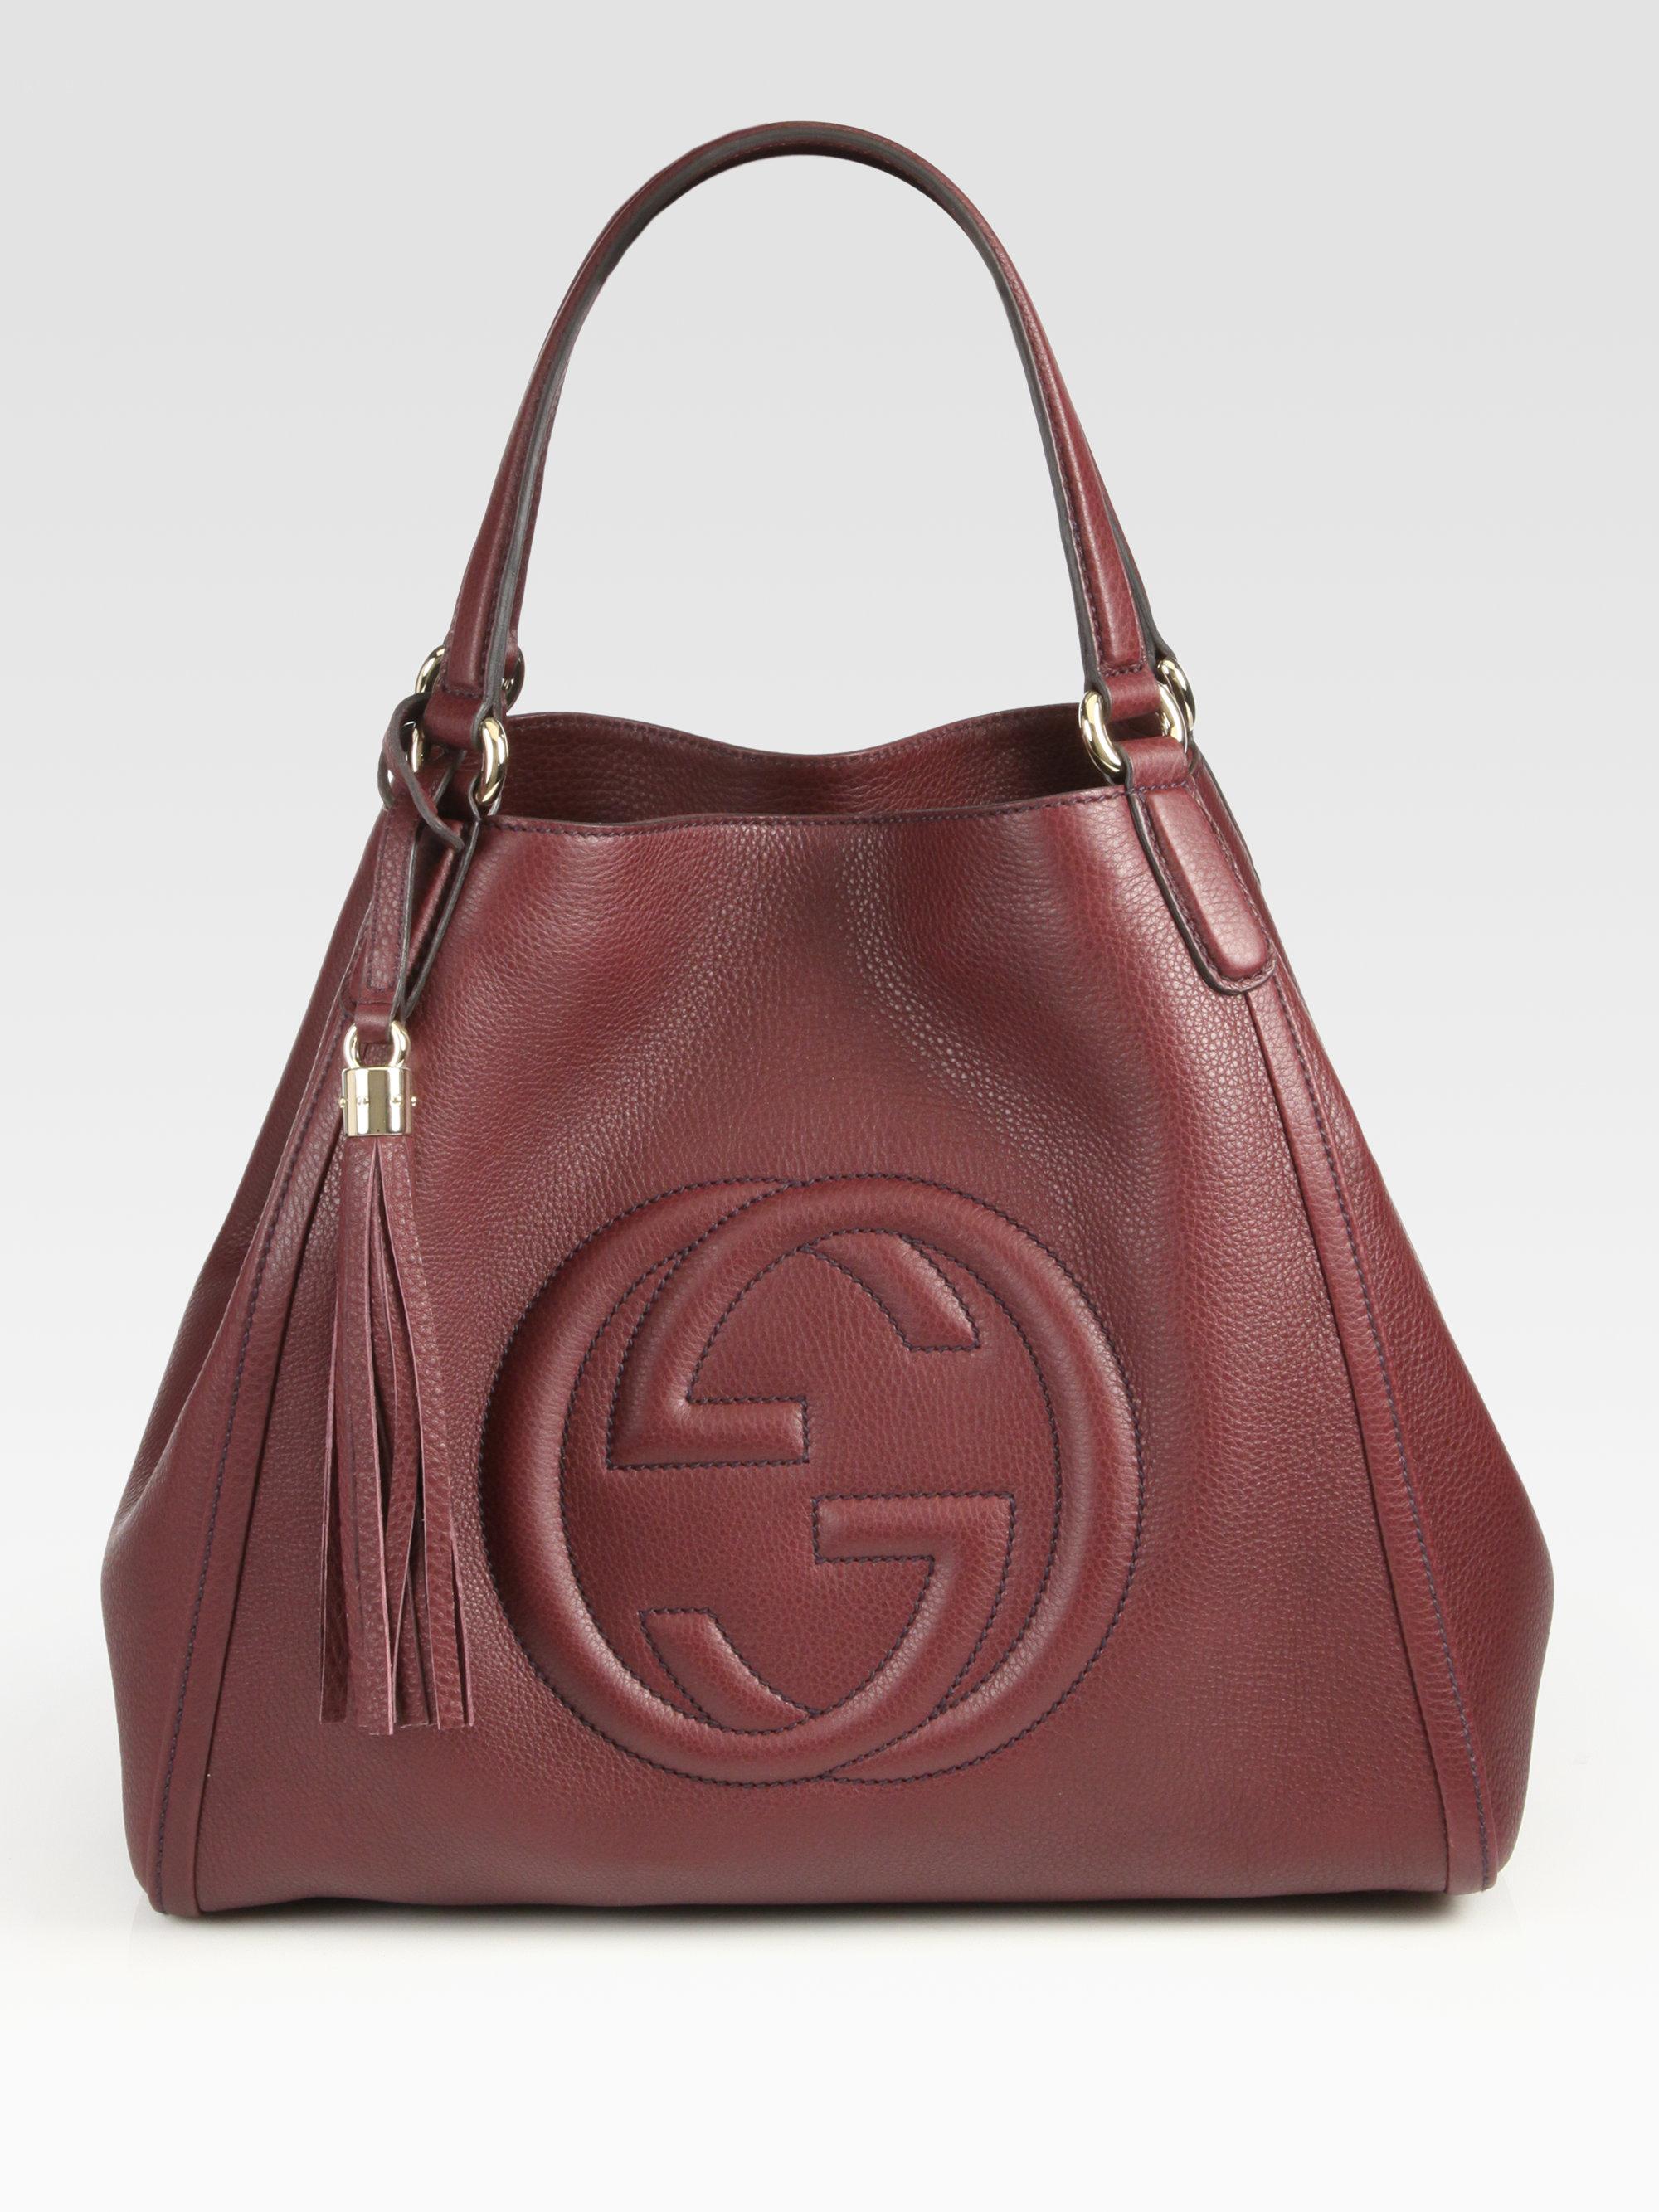 e64f33902ec0e Burgundy Gucci Handbag - Foto Handbag All Collections Salonagafiya.Com